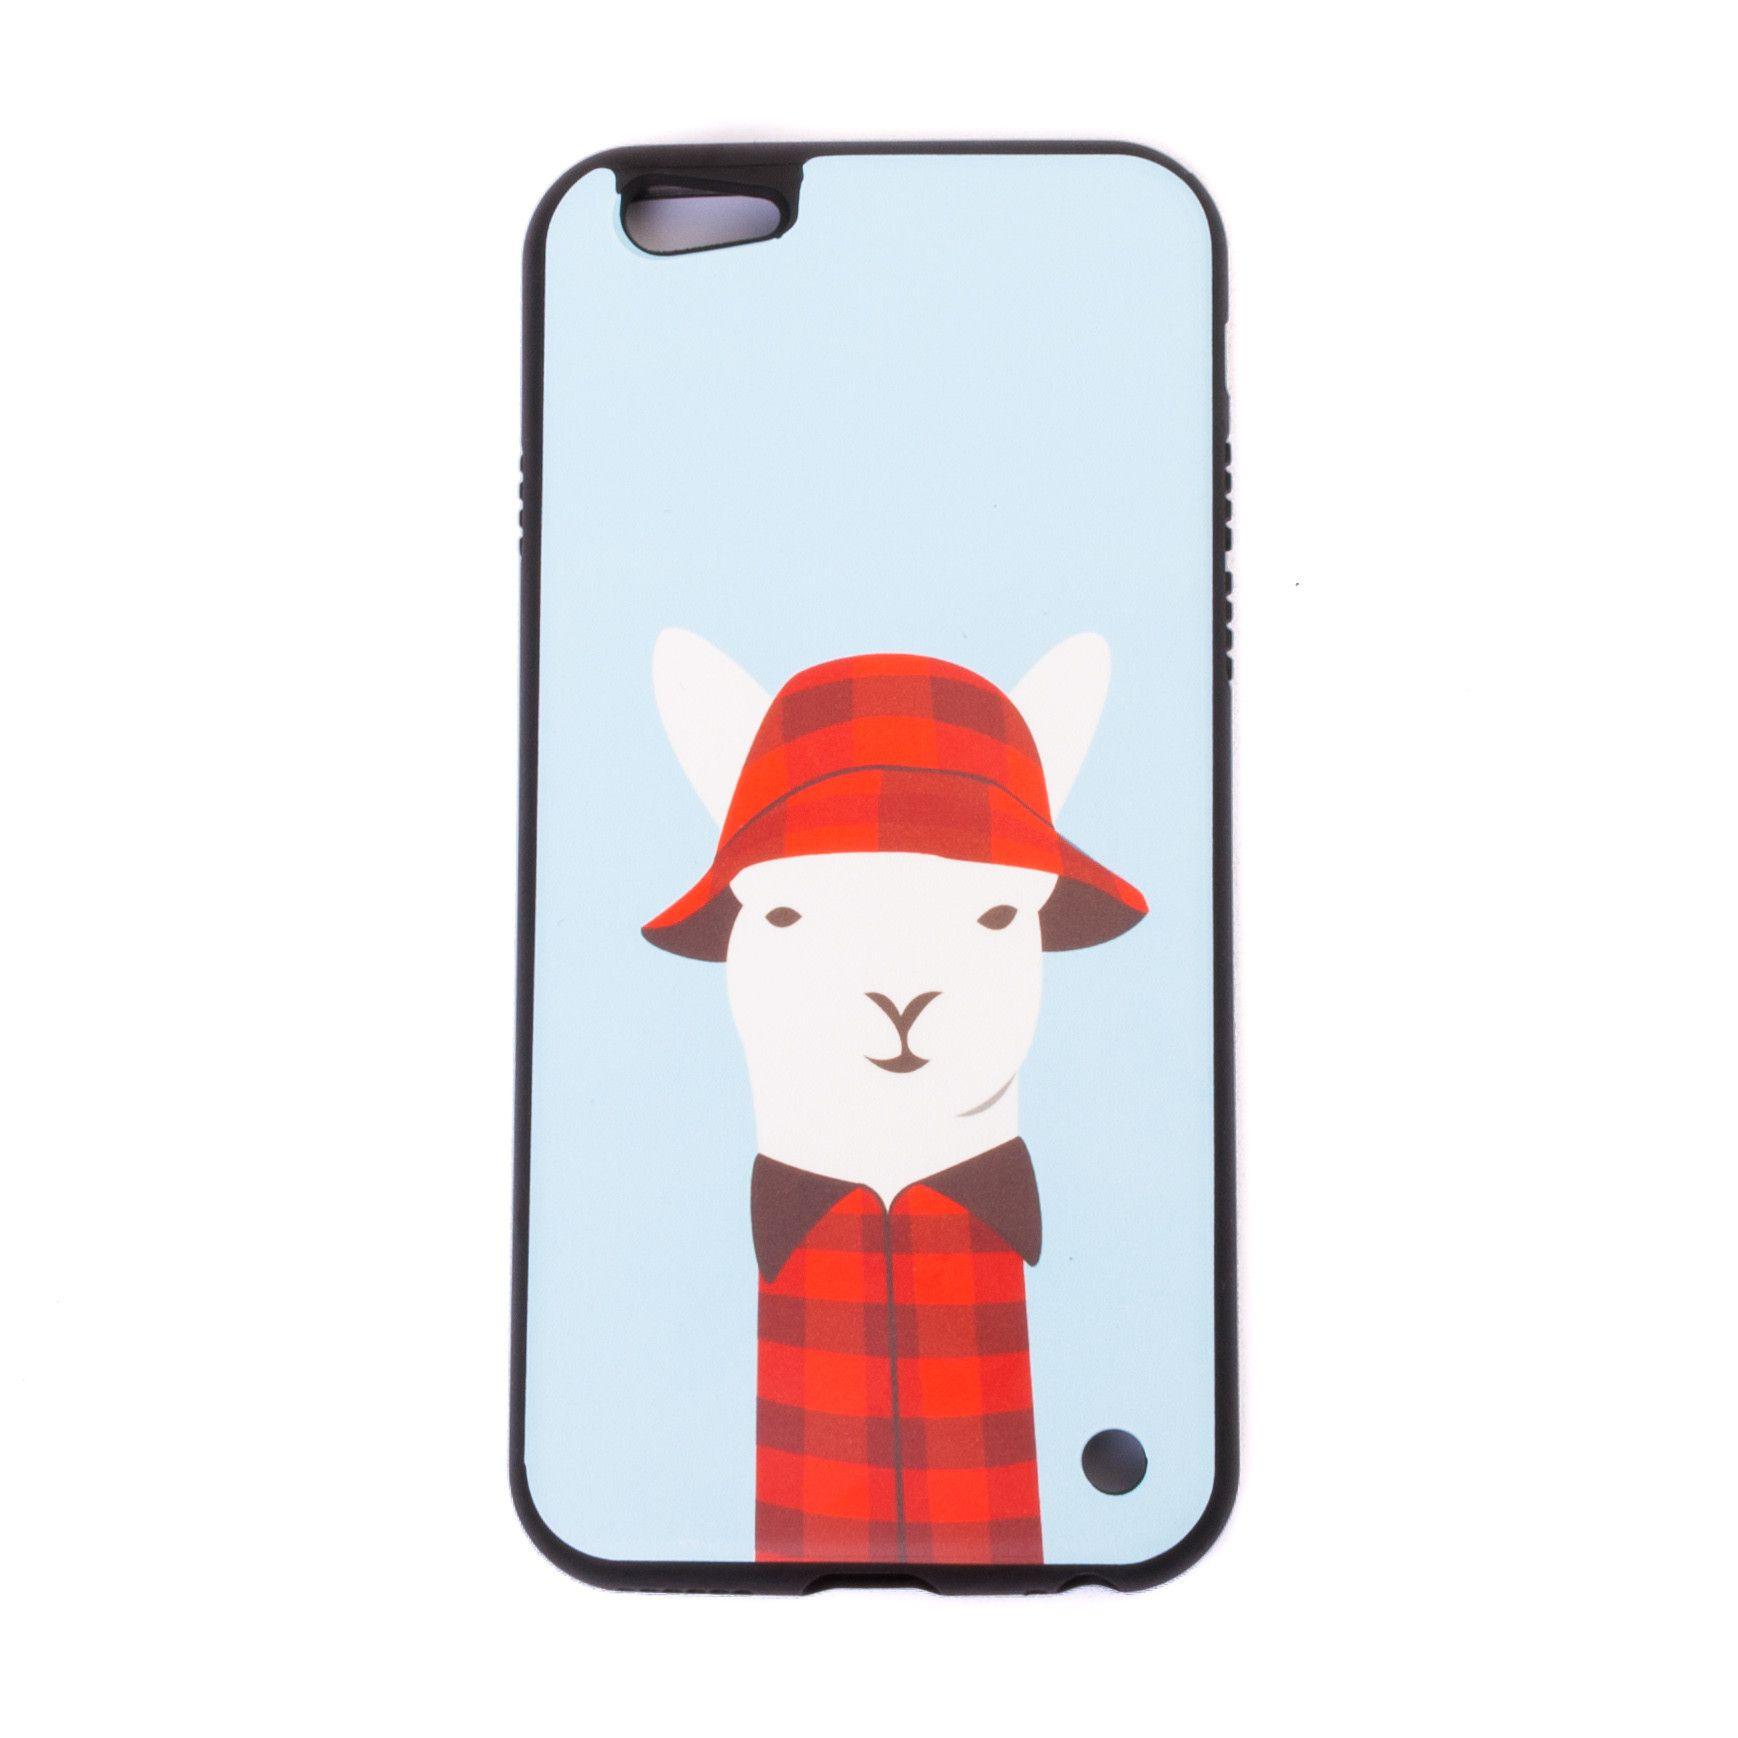 iphone 6s wallet case nz